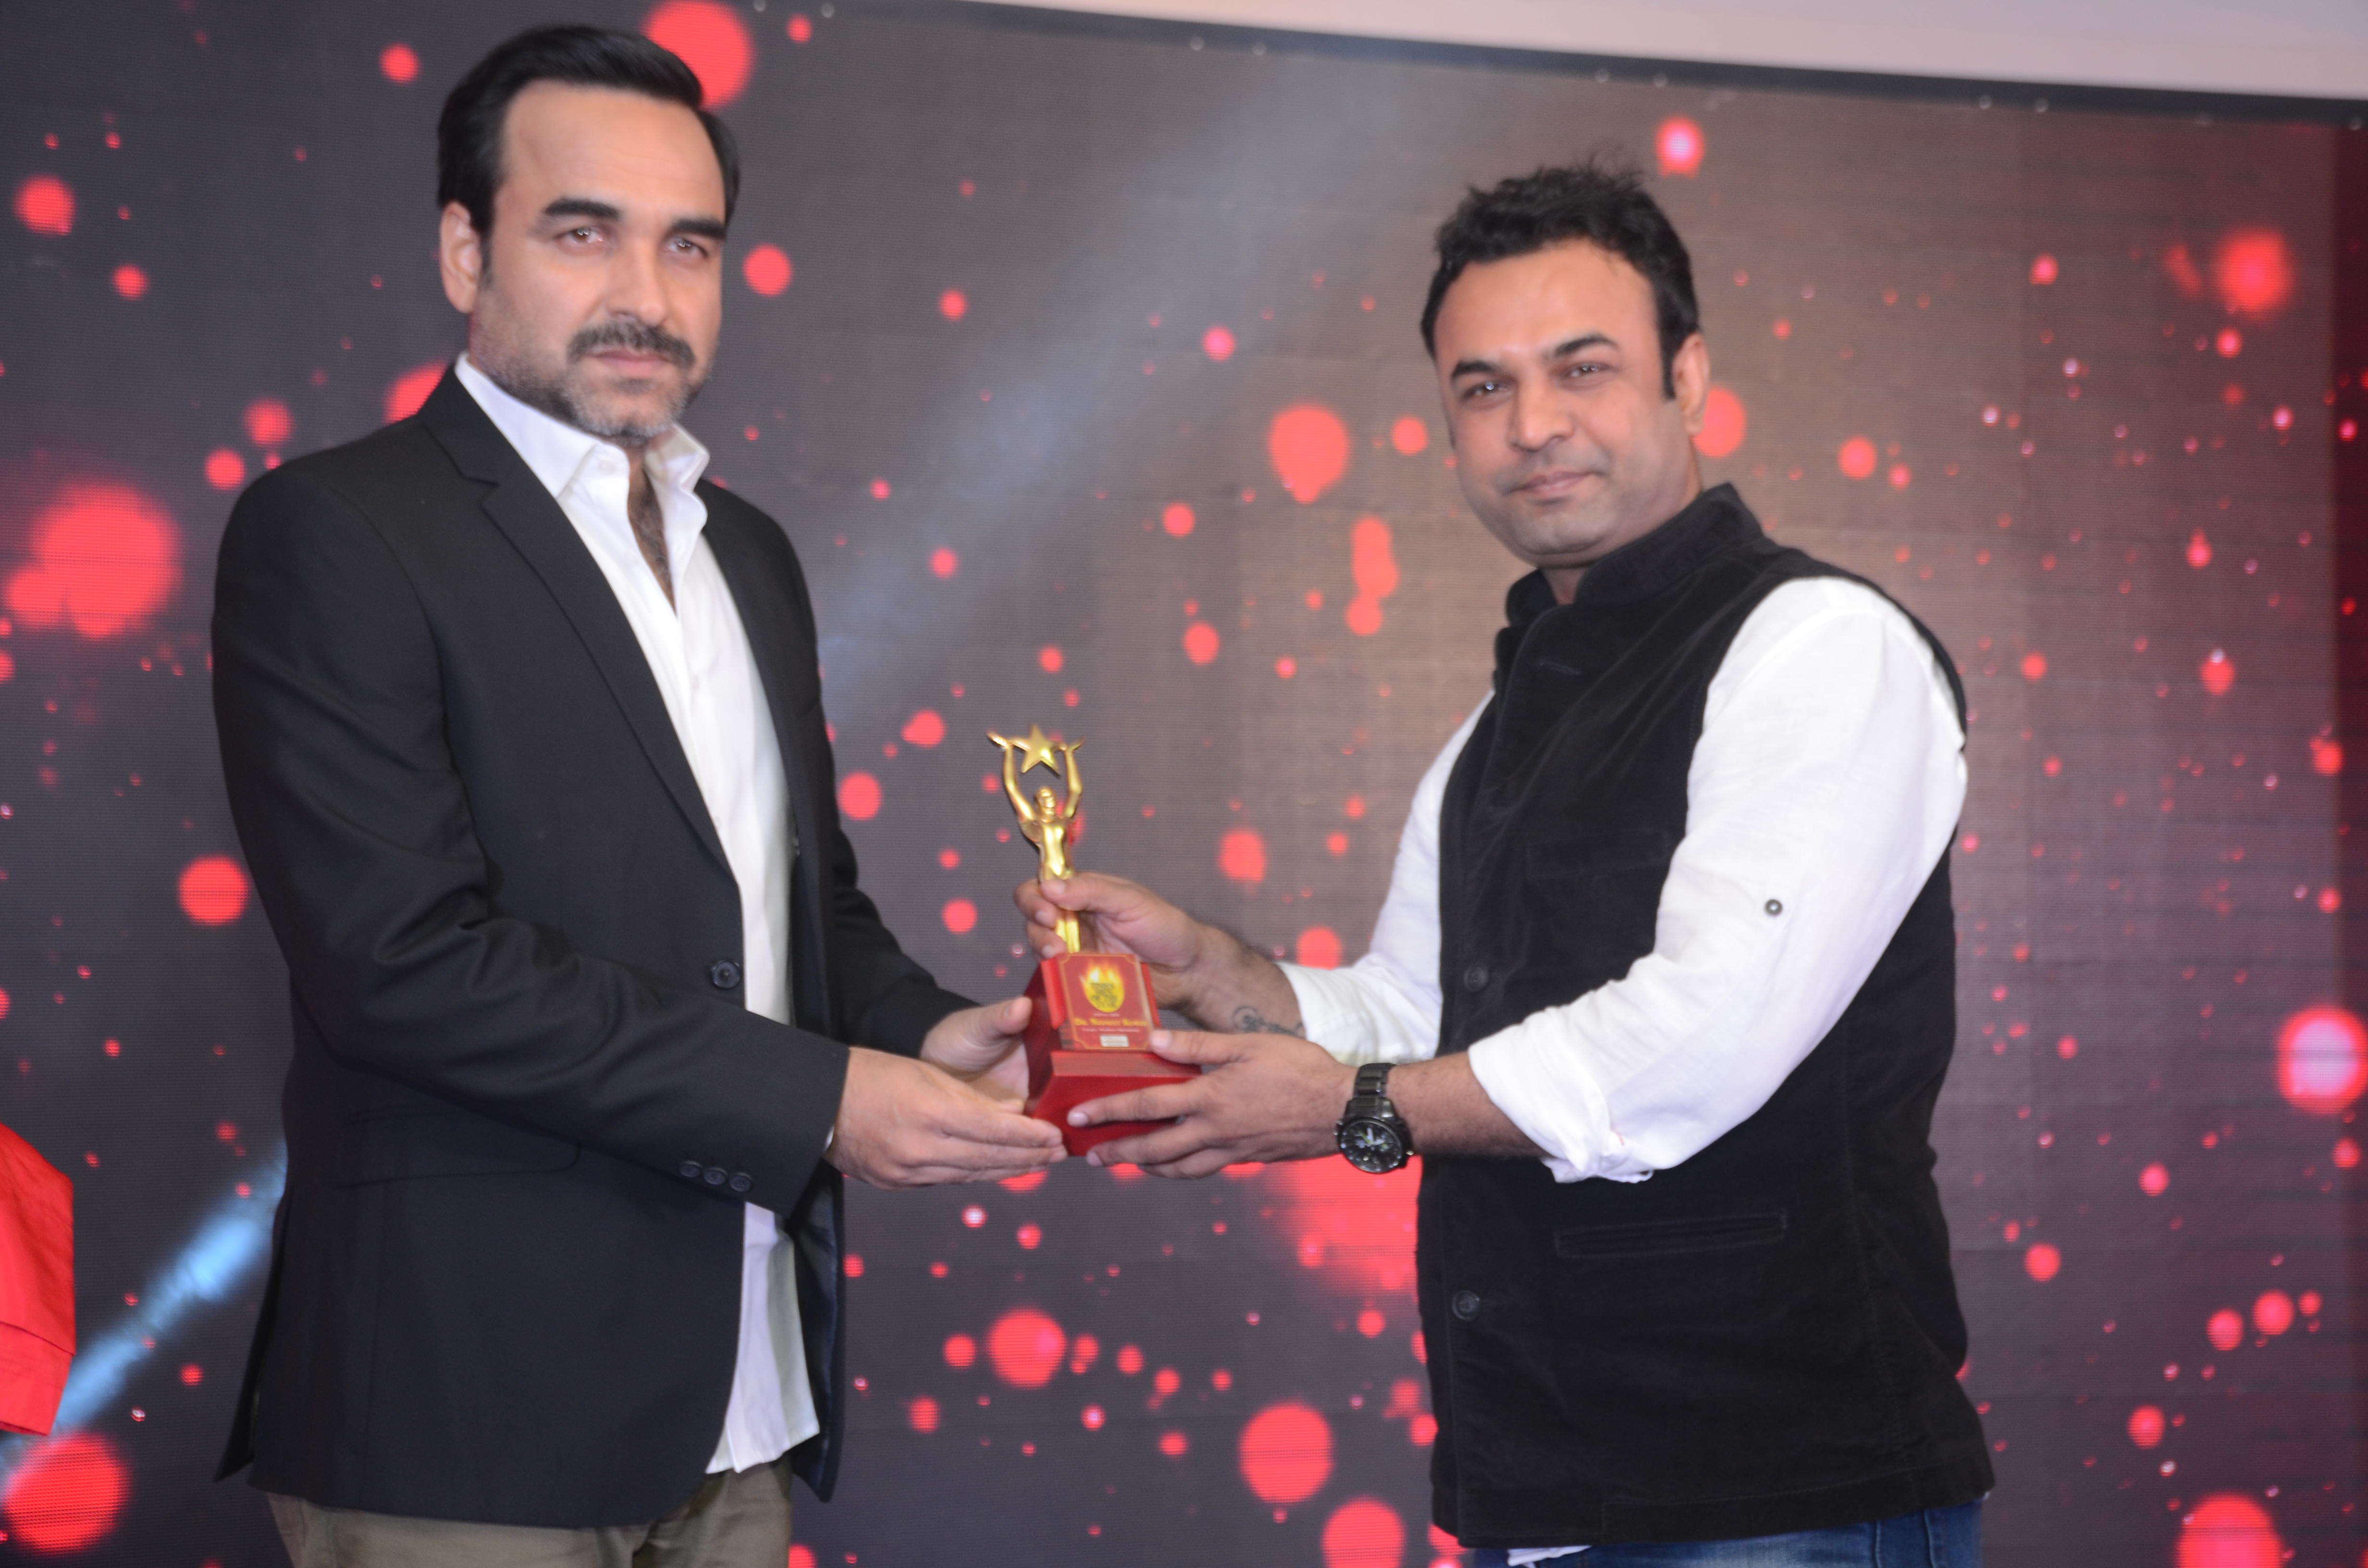 Dr. Navneet Kumar of Vedanta Eye care receives an award from Pankaj Tripathi